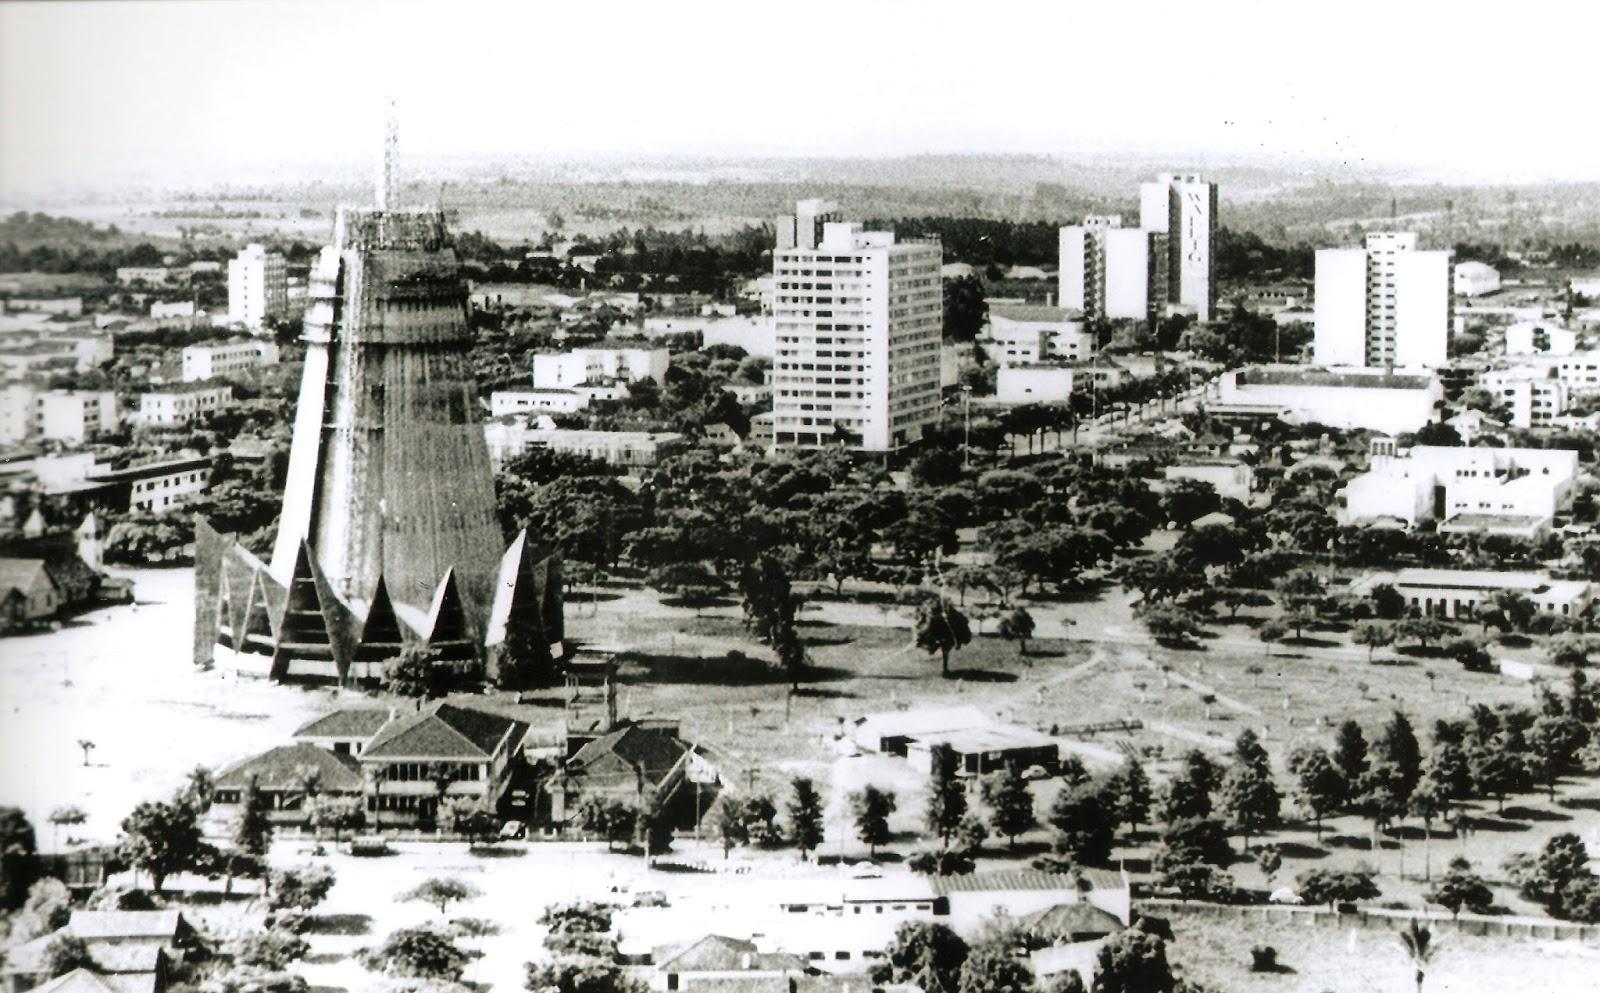 Centro de Maringá - Início dos anos 1970